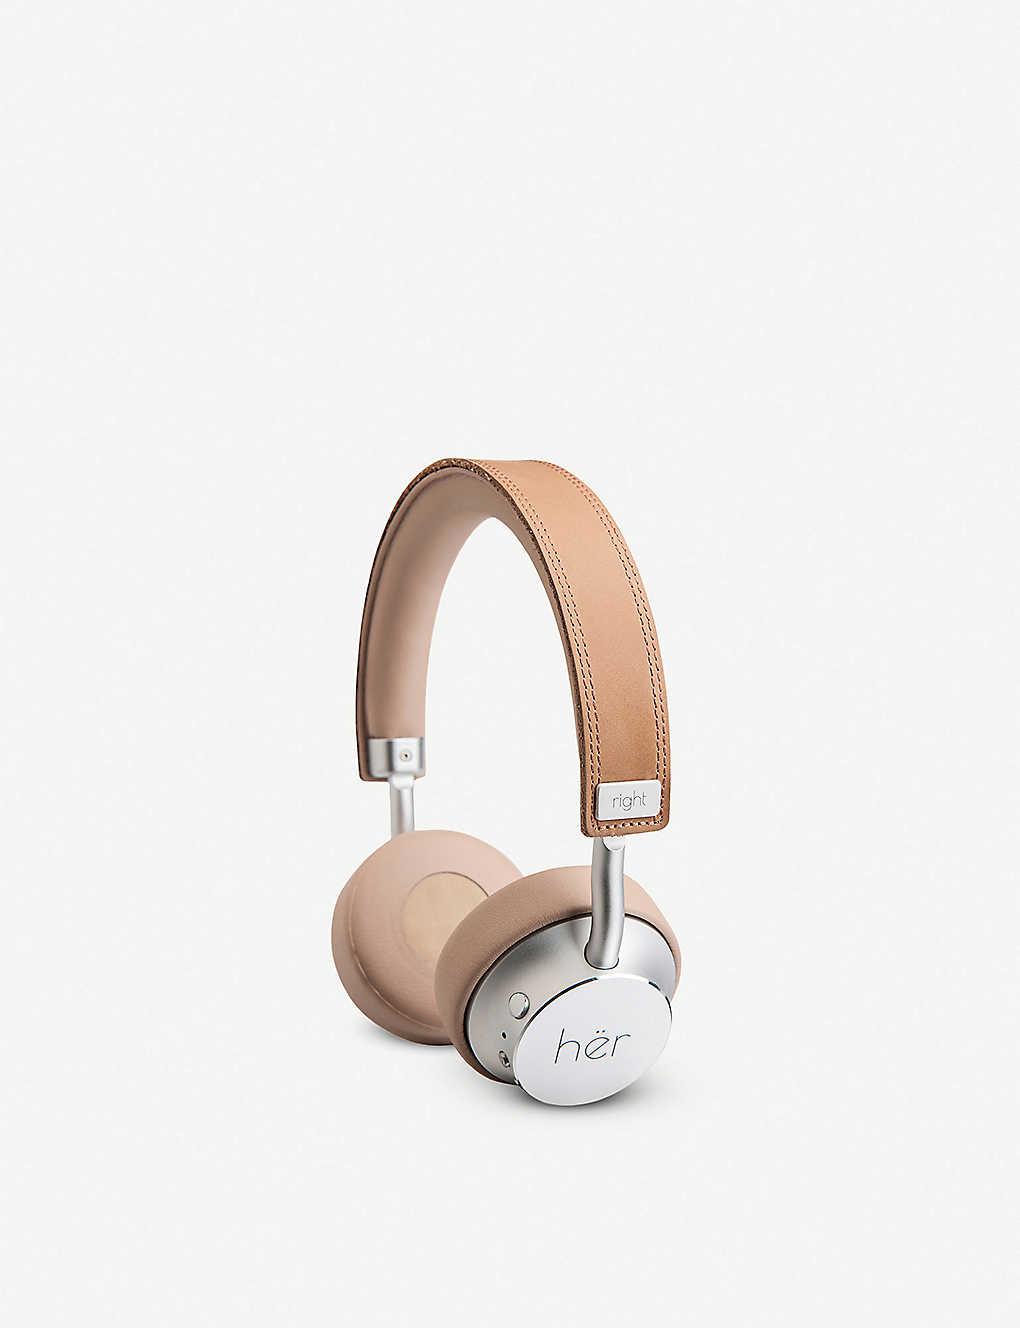 HF8 On-Ear Bluetooth Stereo headphones